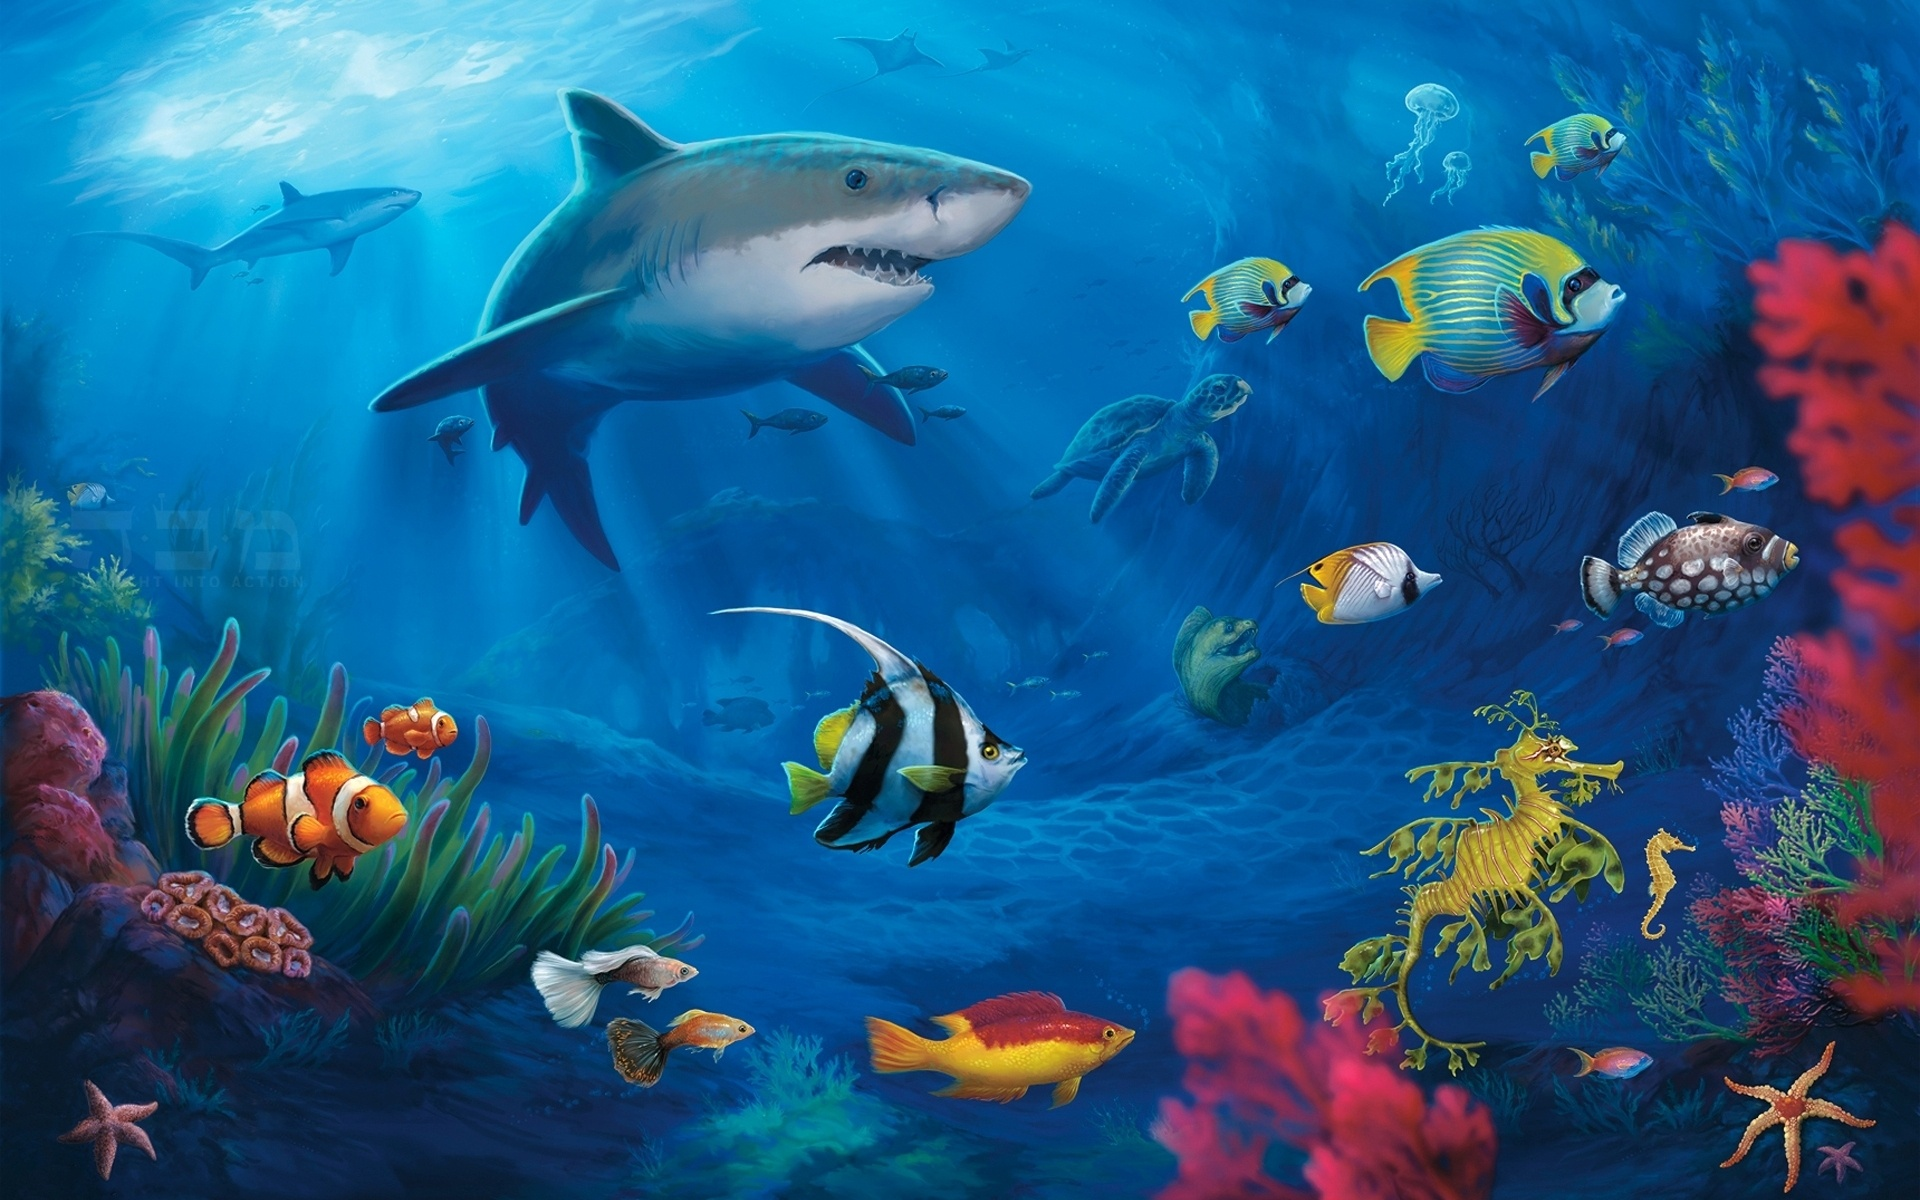 World sharks wallpaper 1920x1200 wallpaper download underwater world